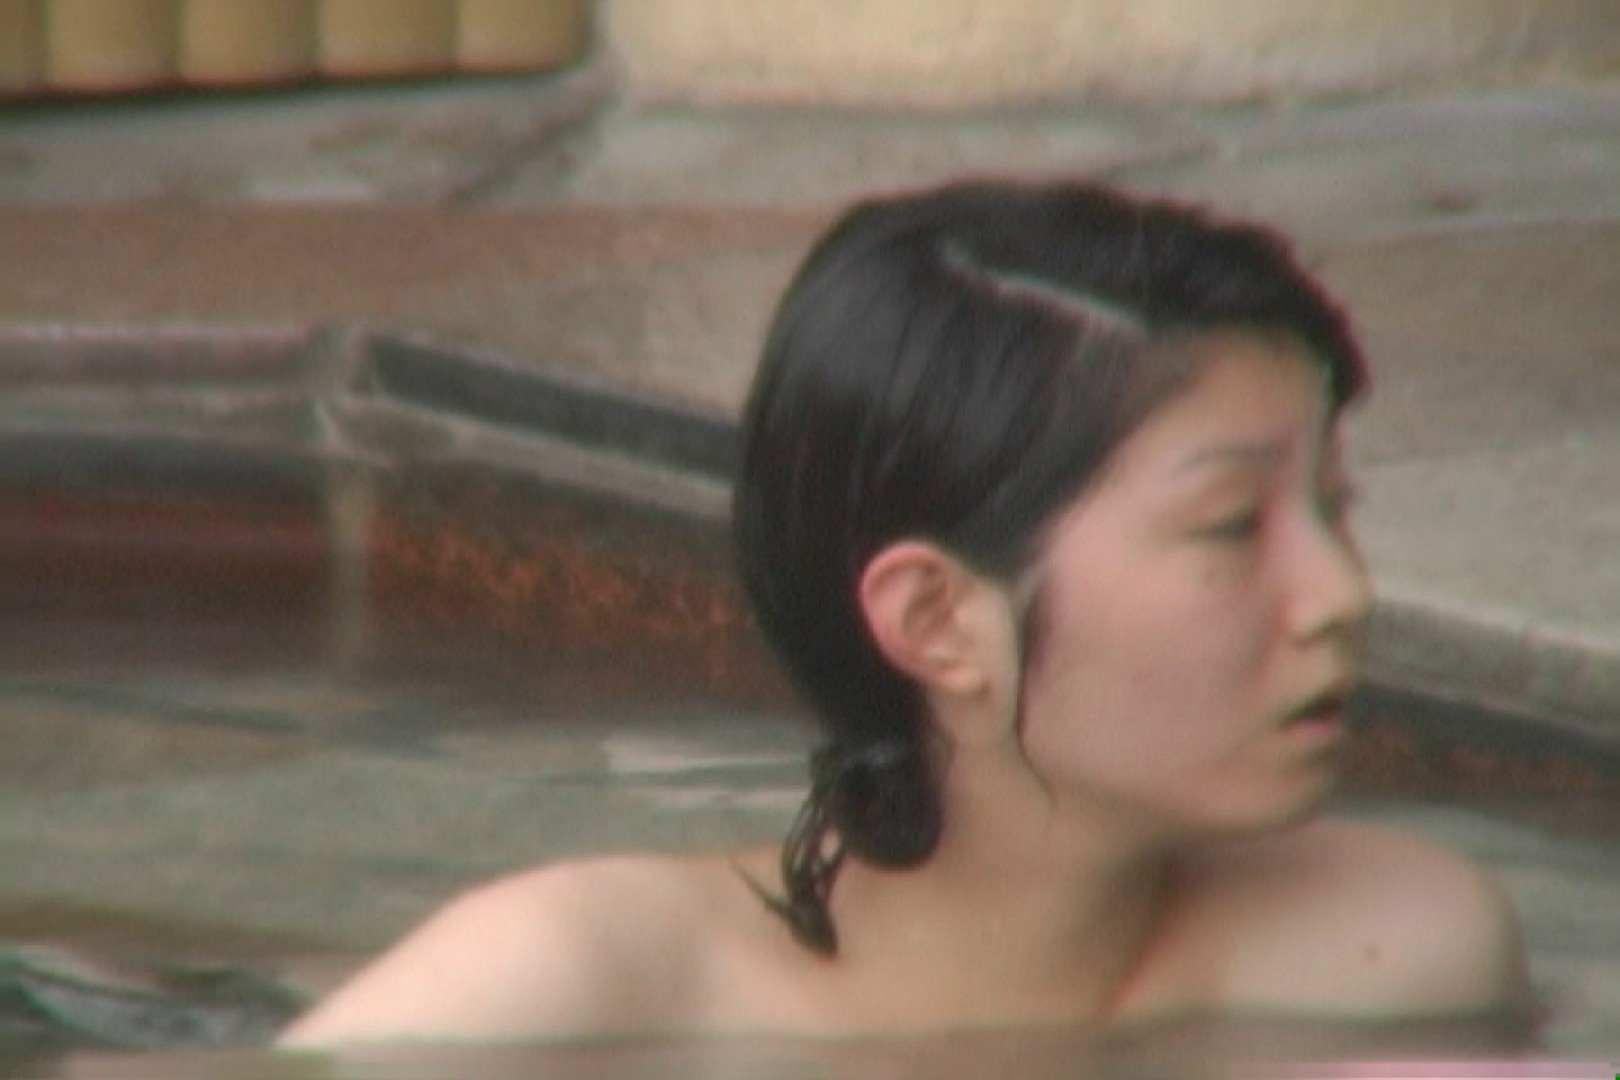 Aquaな露天風呂Vol.579 露天   OLセックス  52画像 37